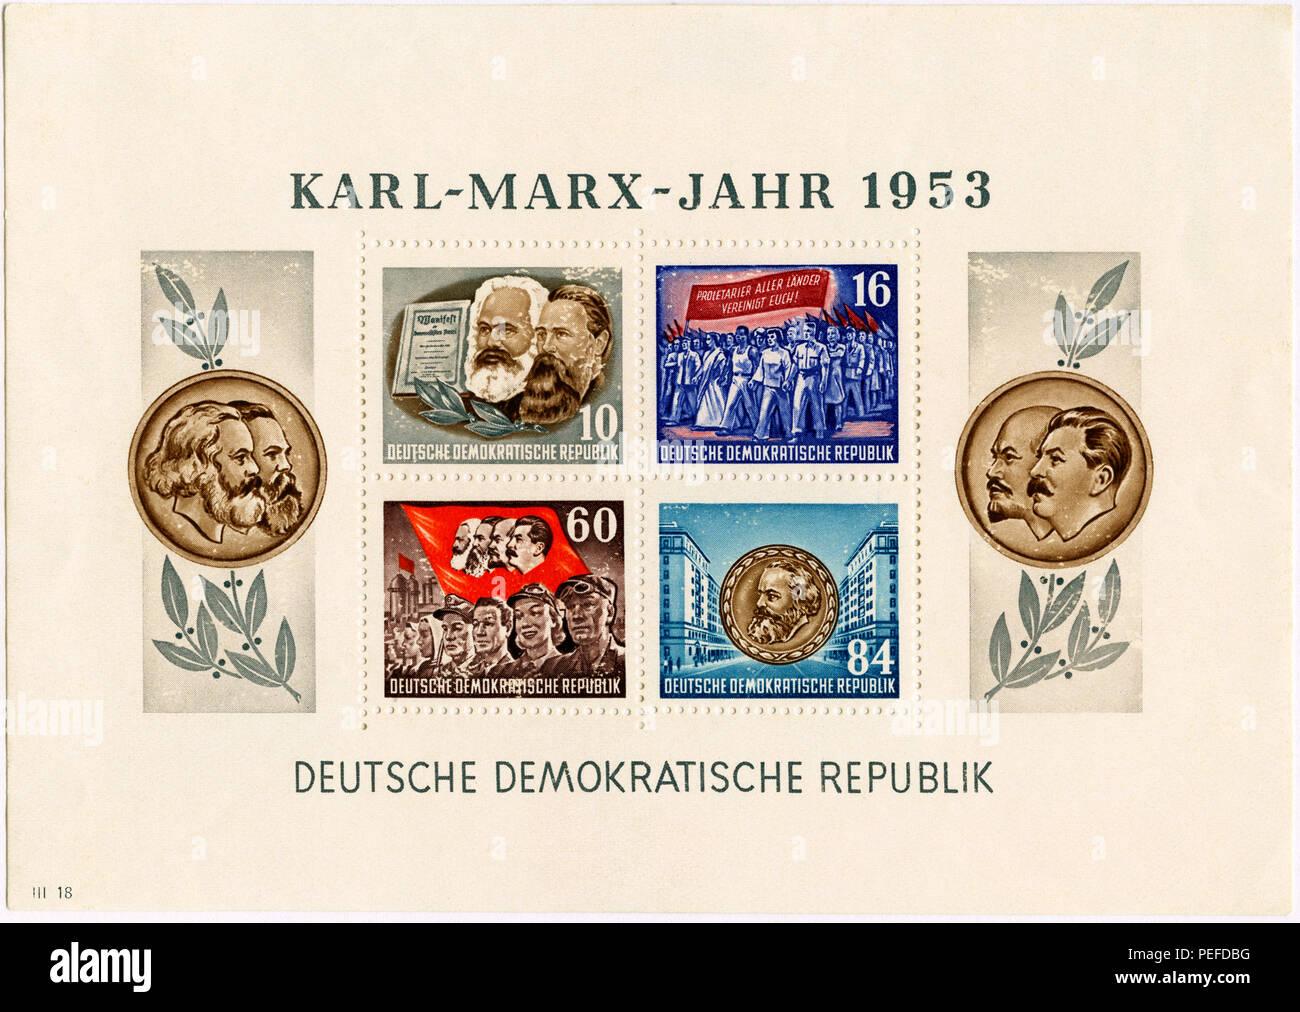 Karl Marx Commemorative Postage Stamp Sheet, East Germany, DDR, 1953 - Stock Image